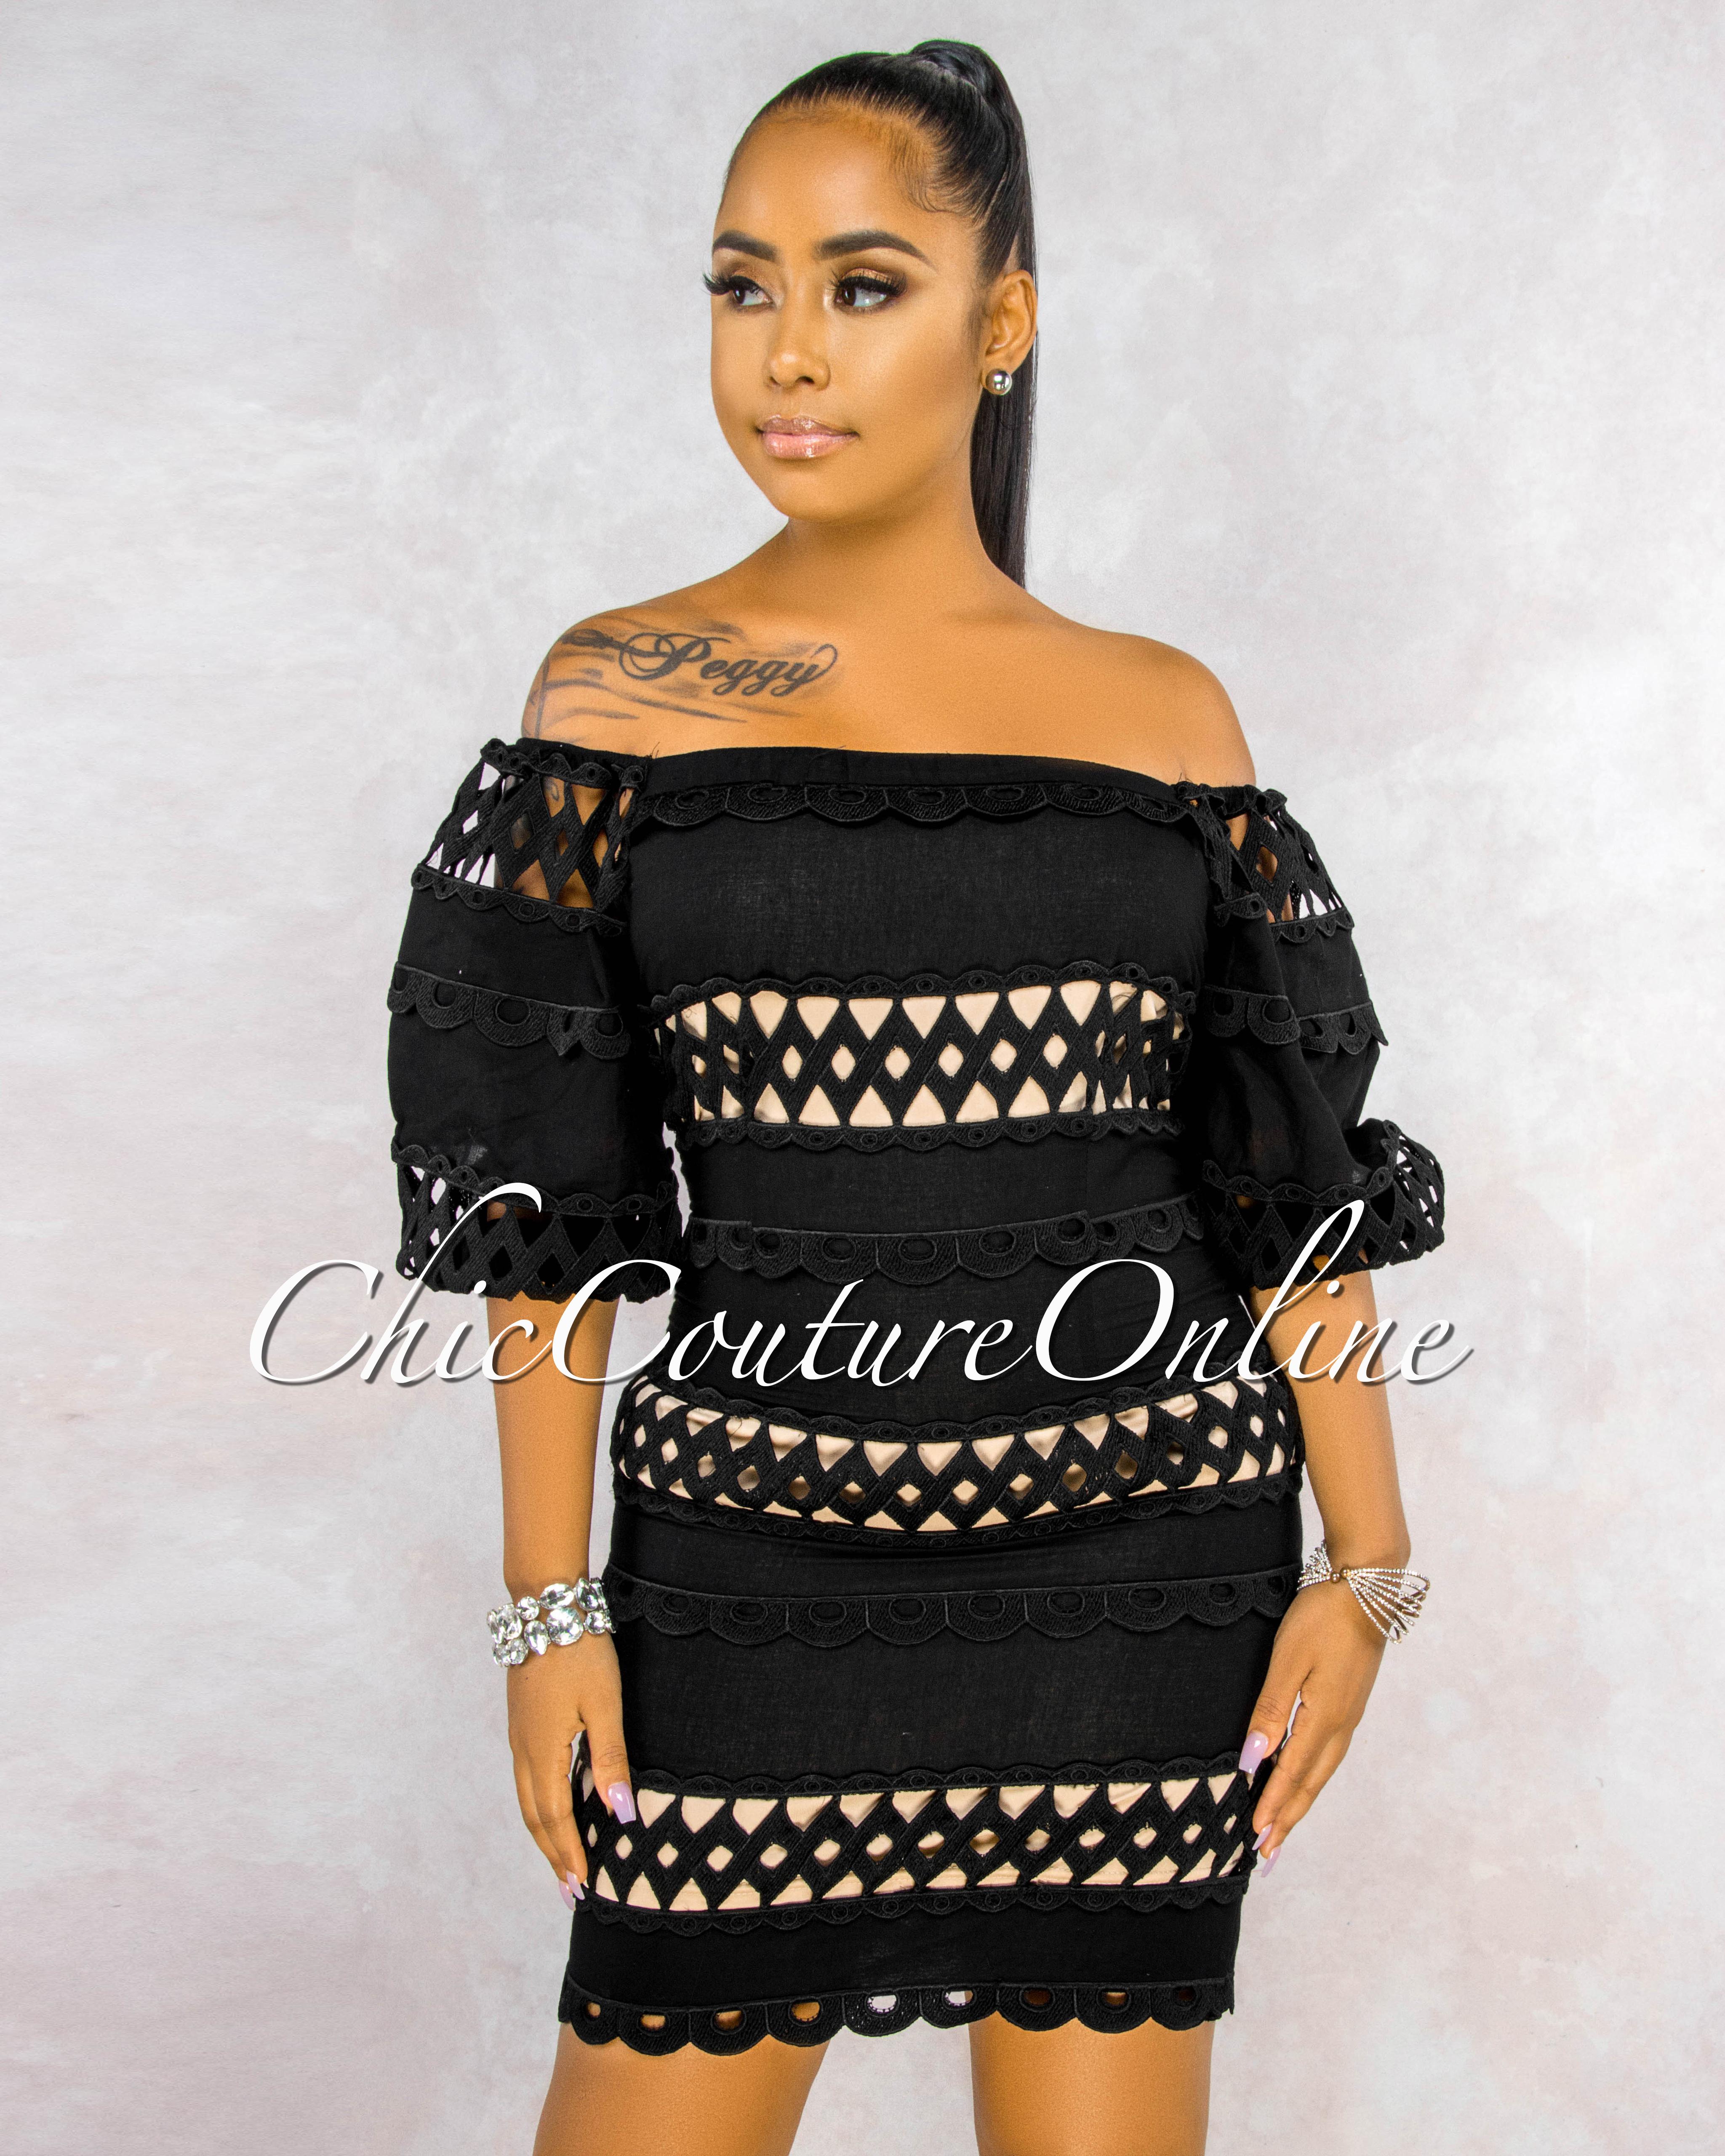 Dimy Black Crochet Nude Illusion Off-The Shoulder Dress